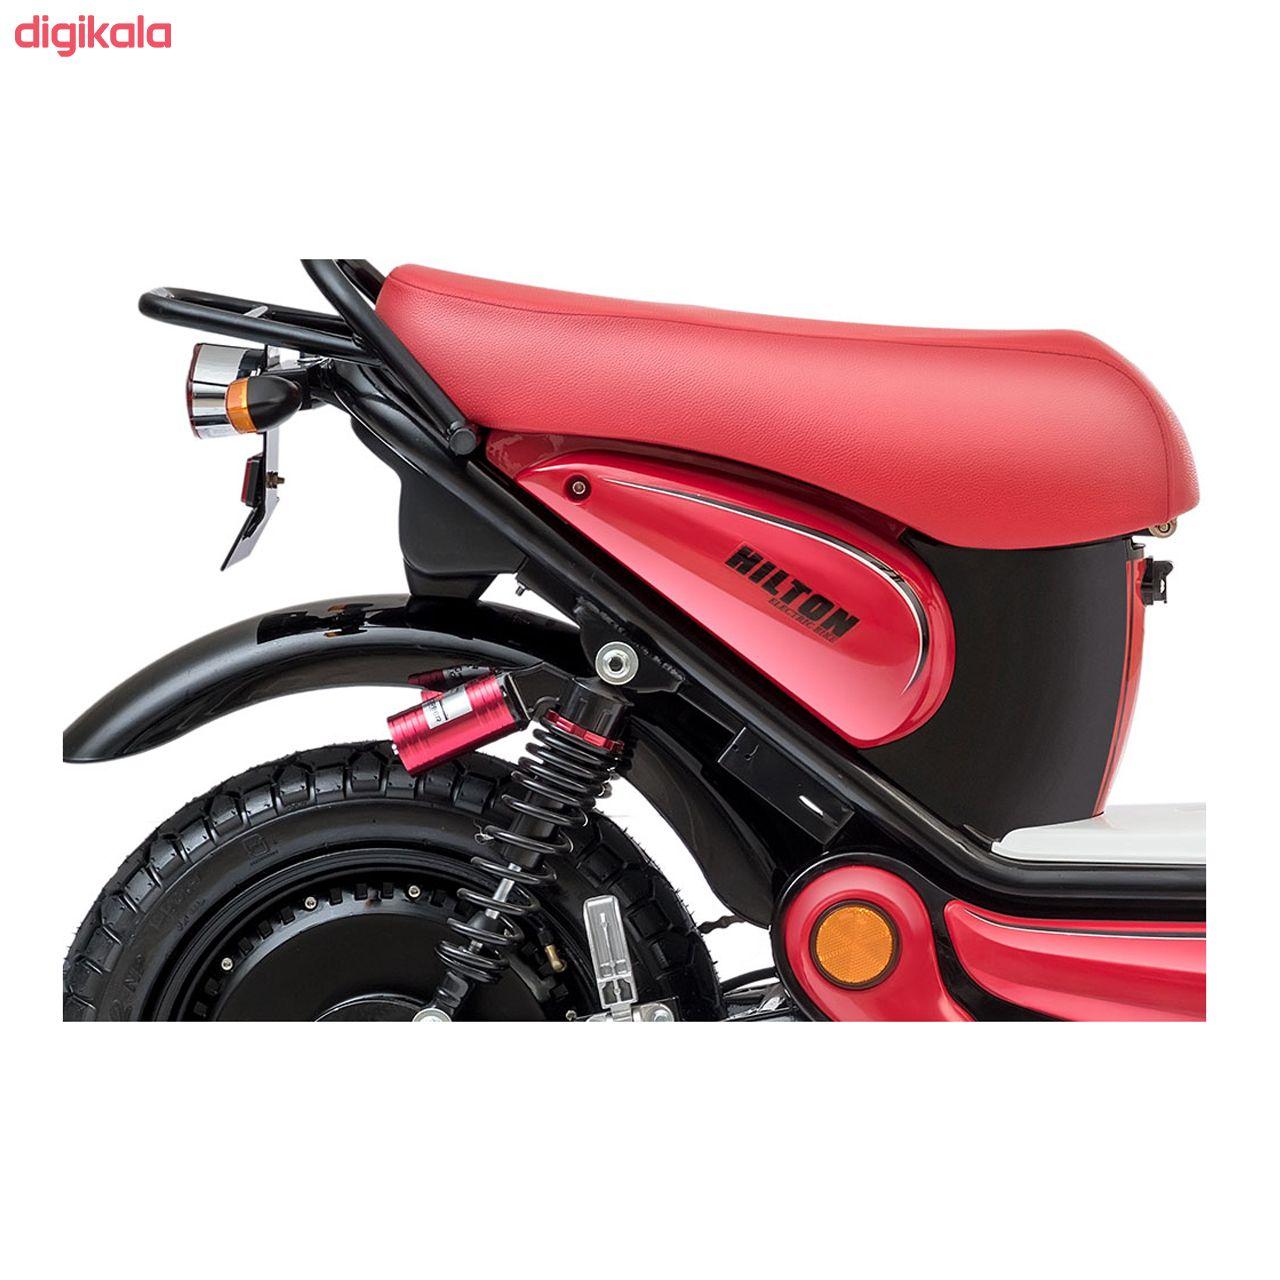 موتورسیکلت  گلکسی مدل 1500ETسی سی سال 1399 main 1 3